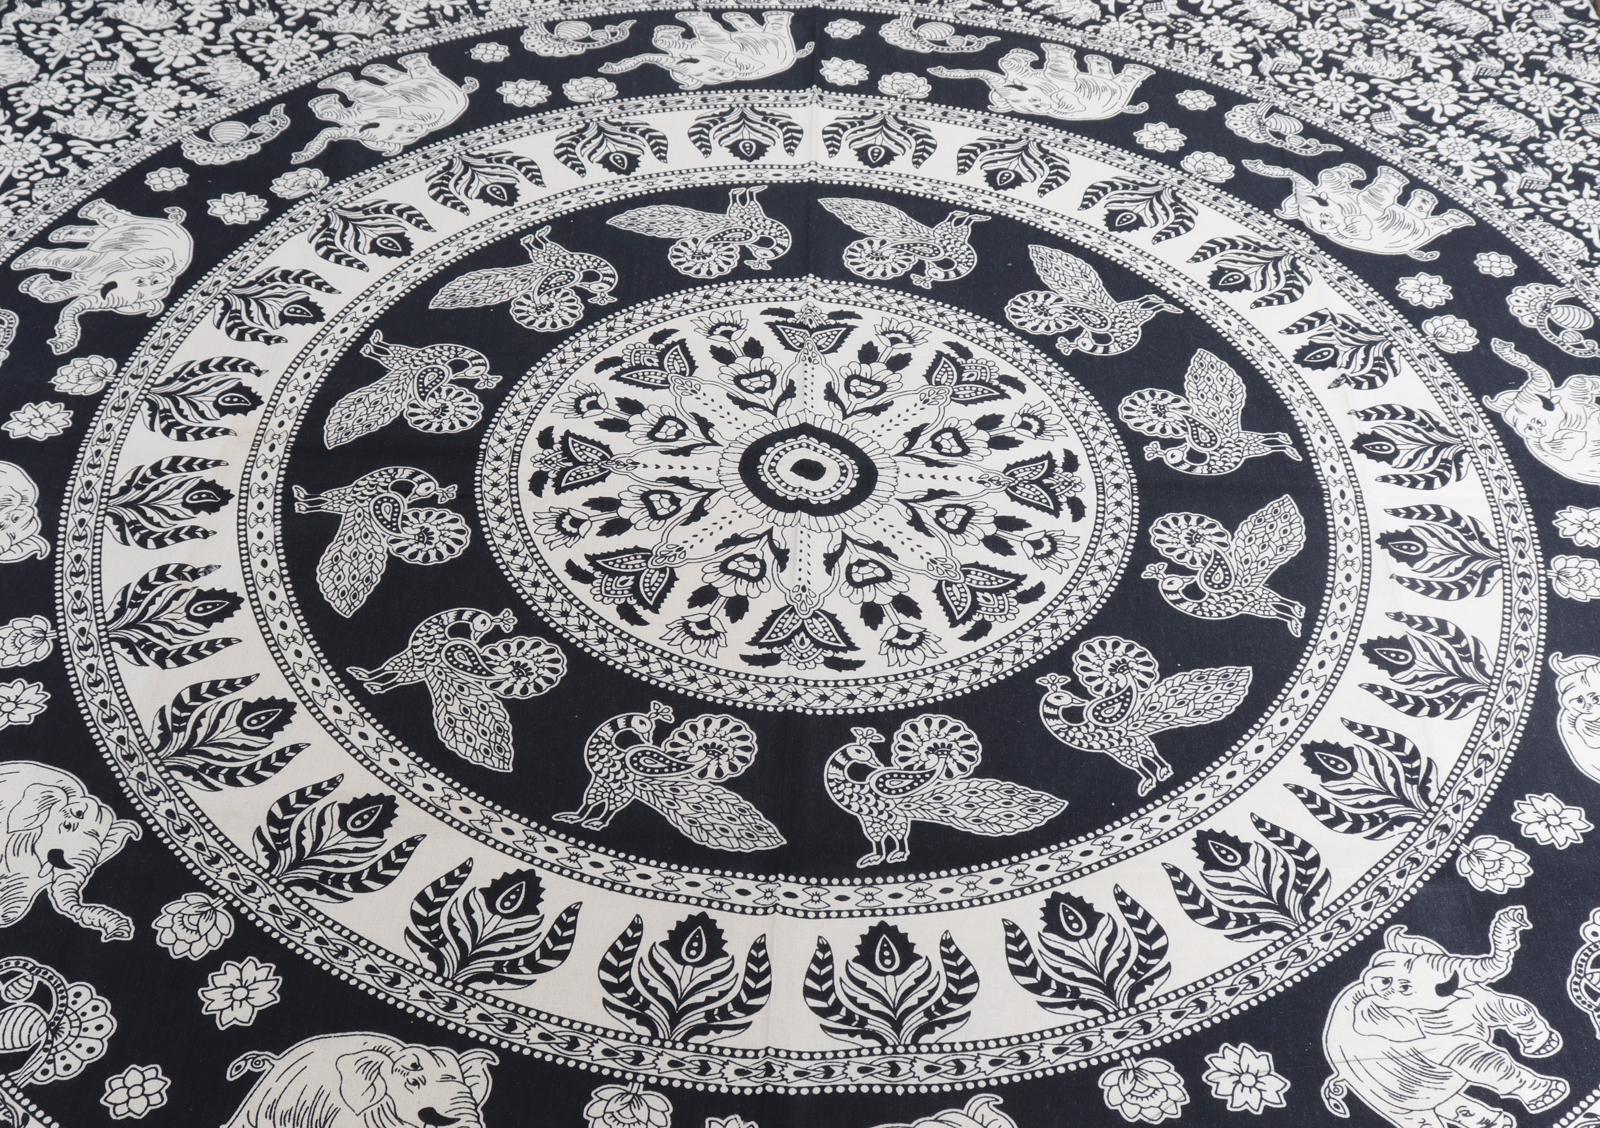 Mandala Tapestry Bedspread